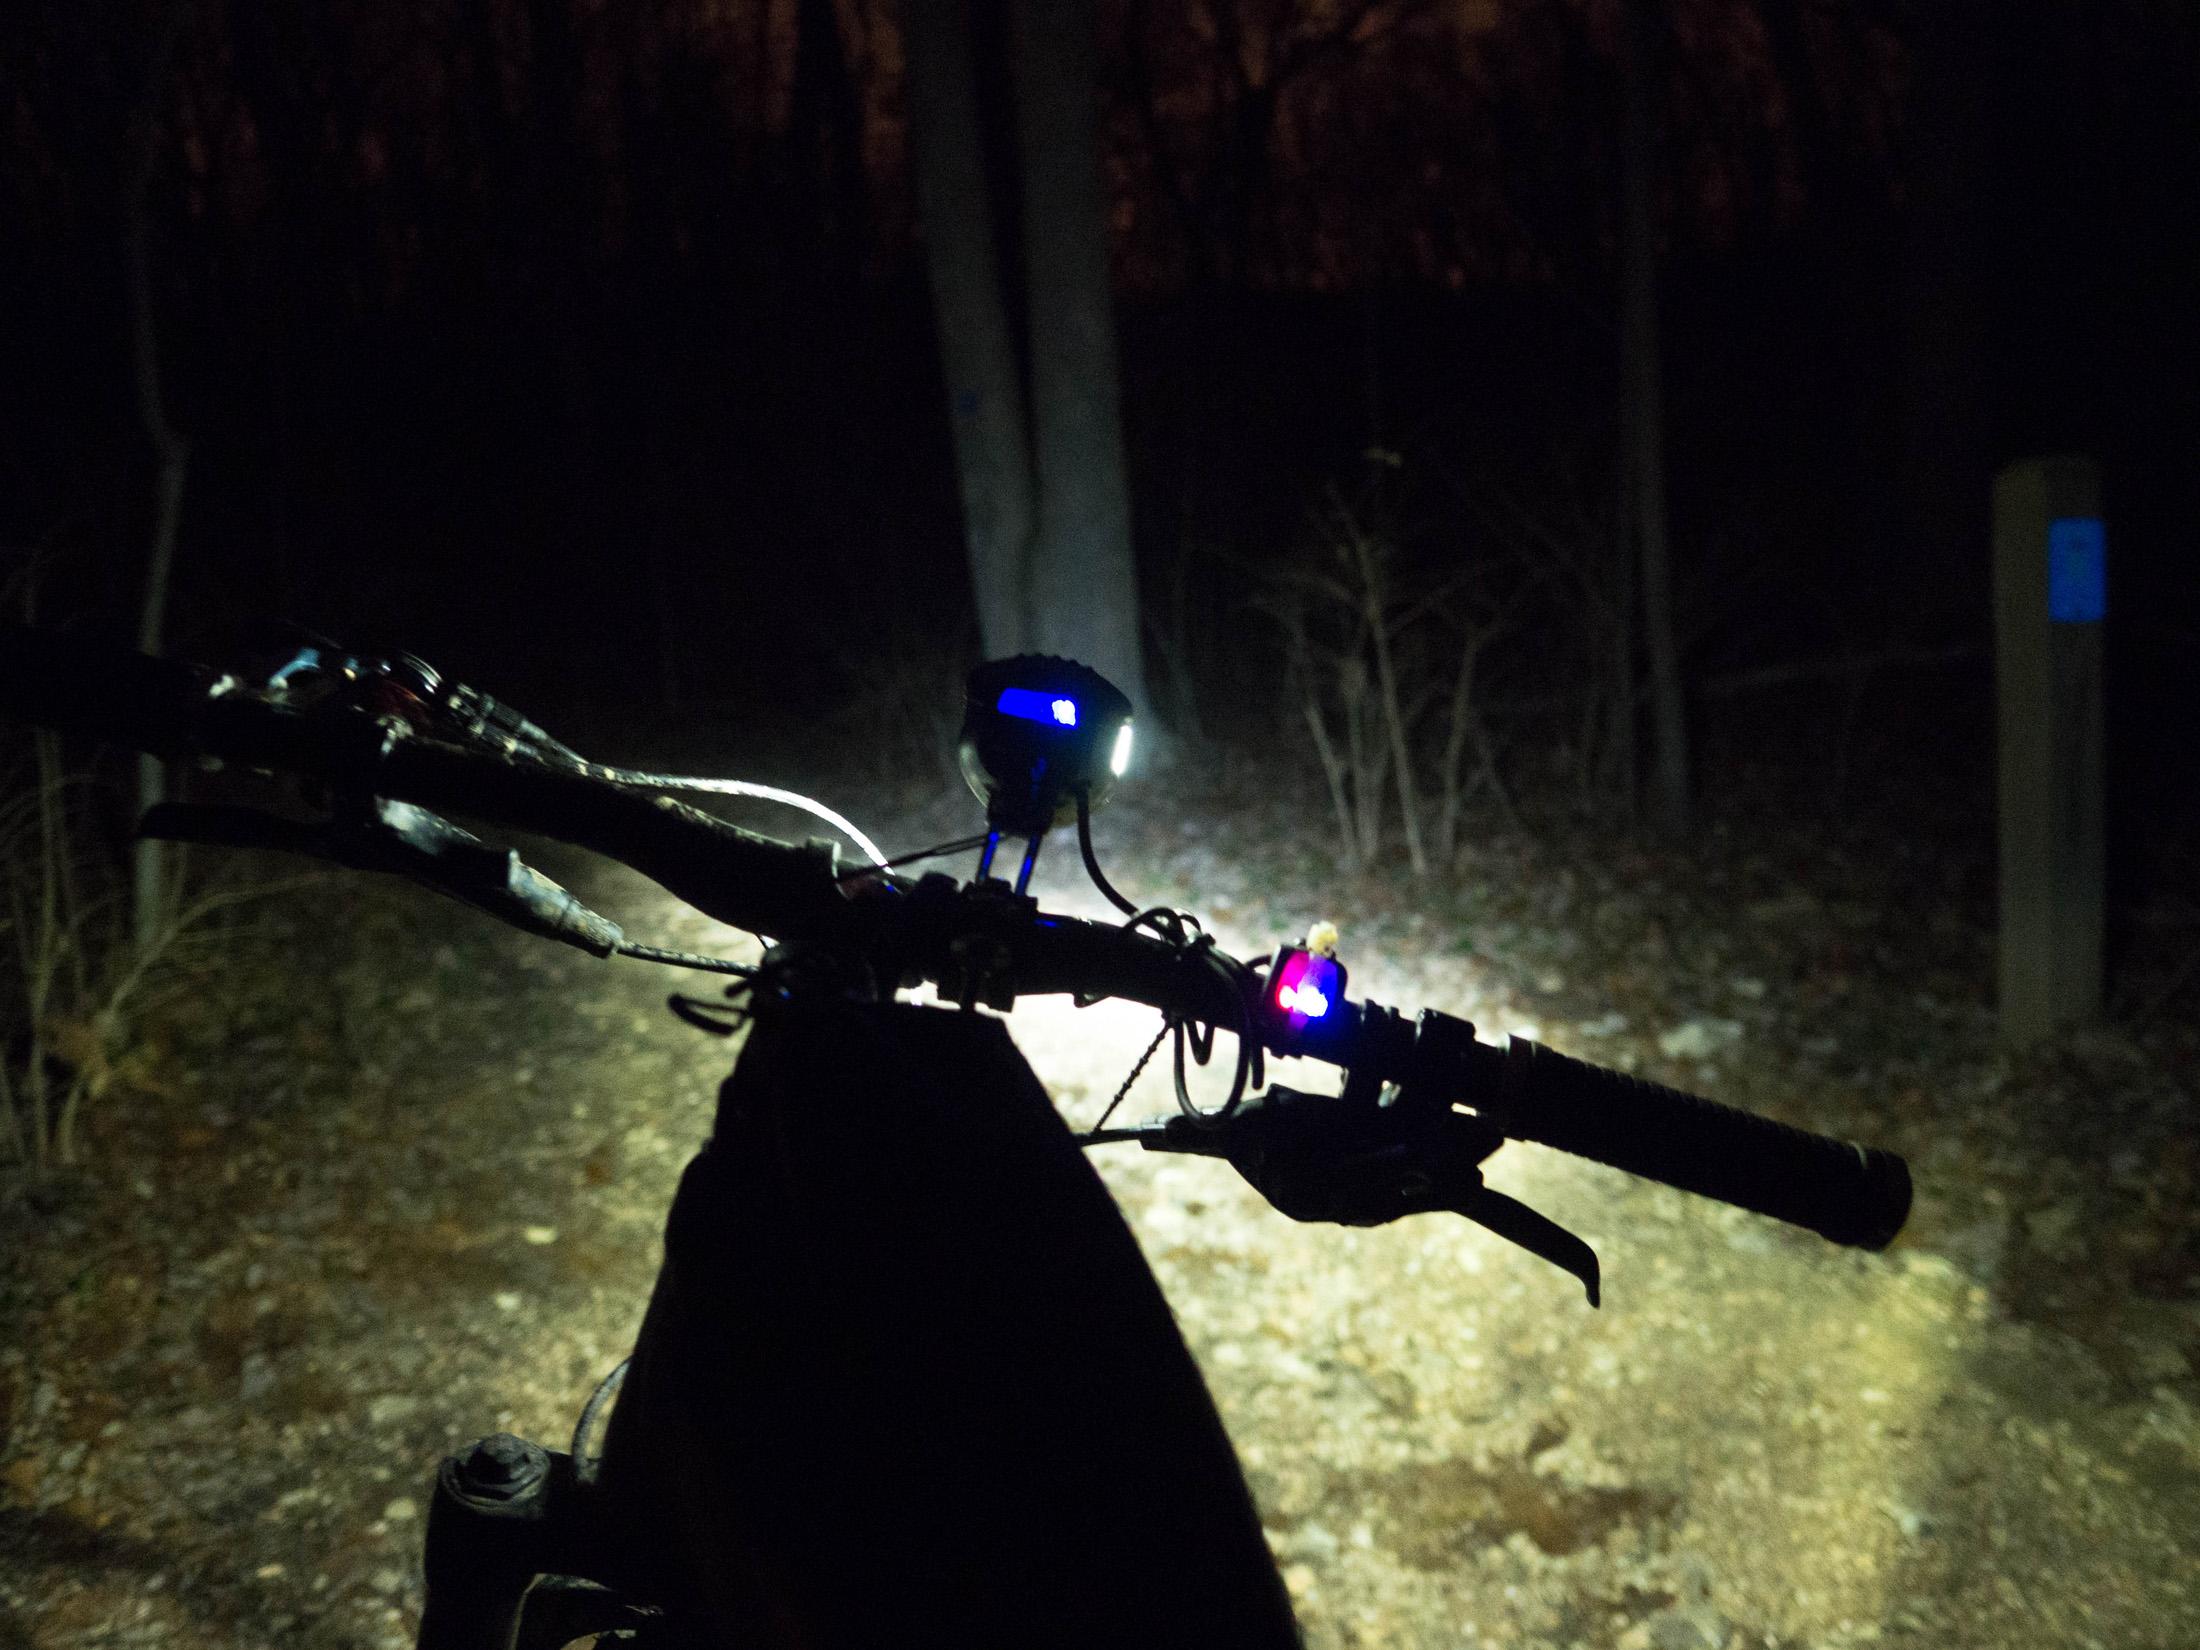 Scott's headlight, a Busch and Muller Luxos U, on the trails back home in Missouri.